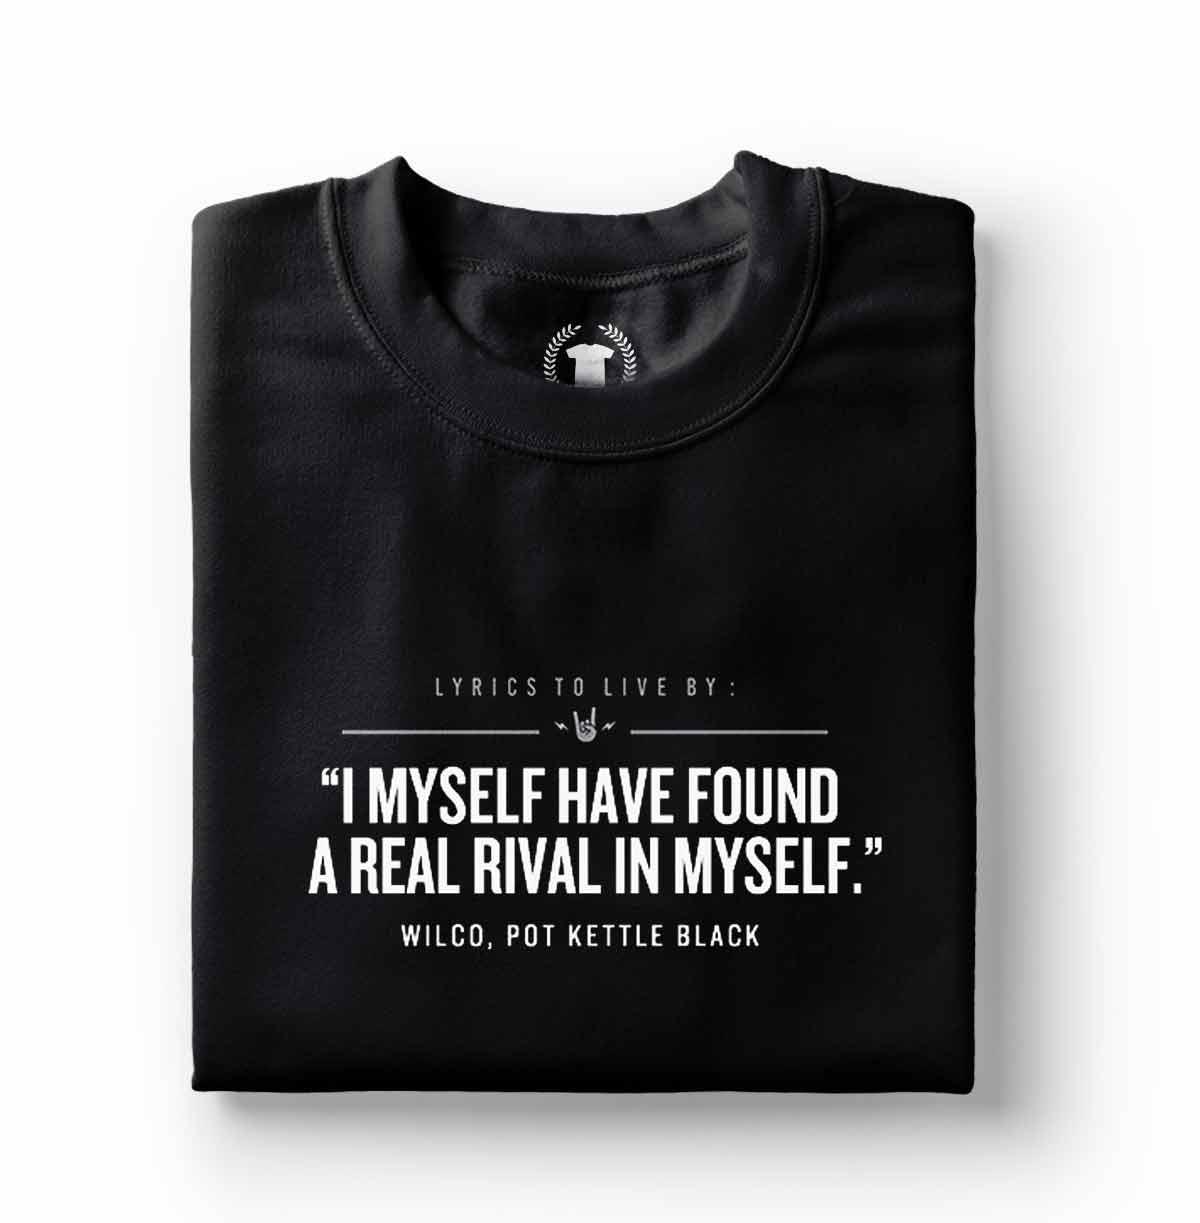 camiseta wilco pot kettle black